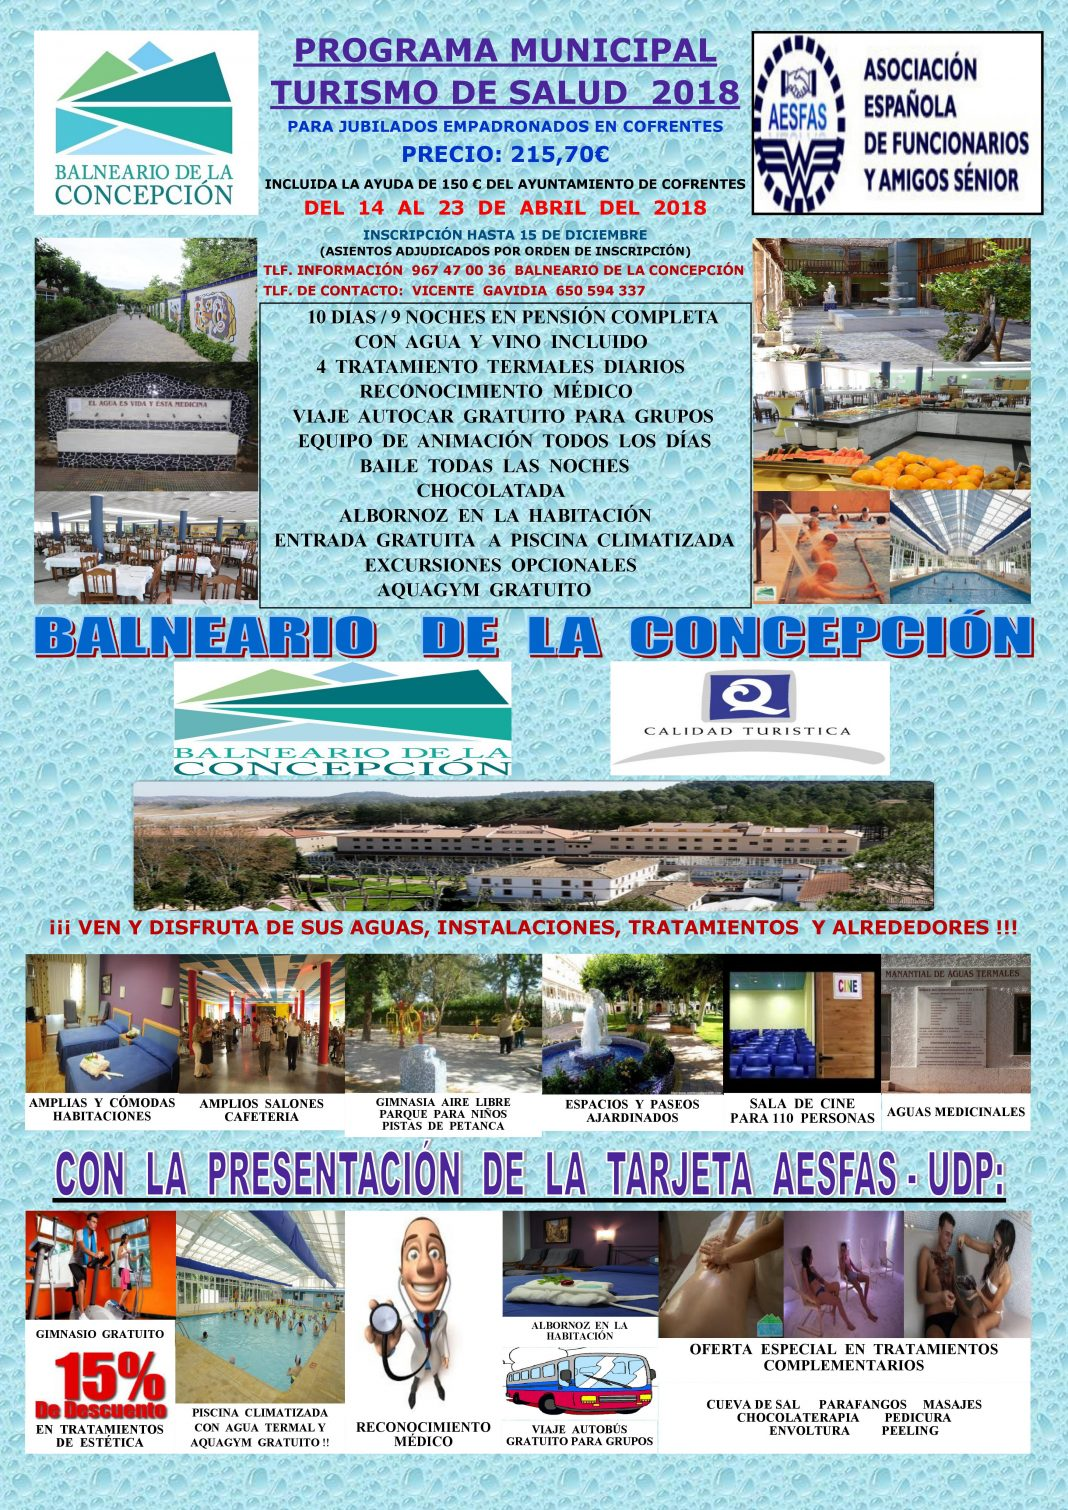 Programa Municipal de Turismo de Salud de Cofrentes 2018